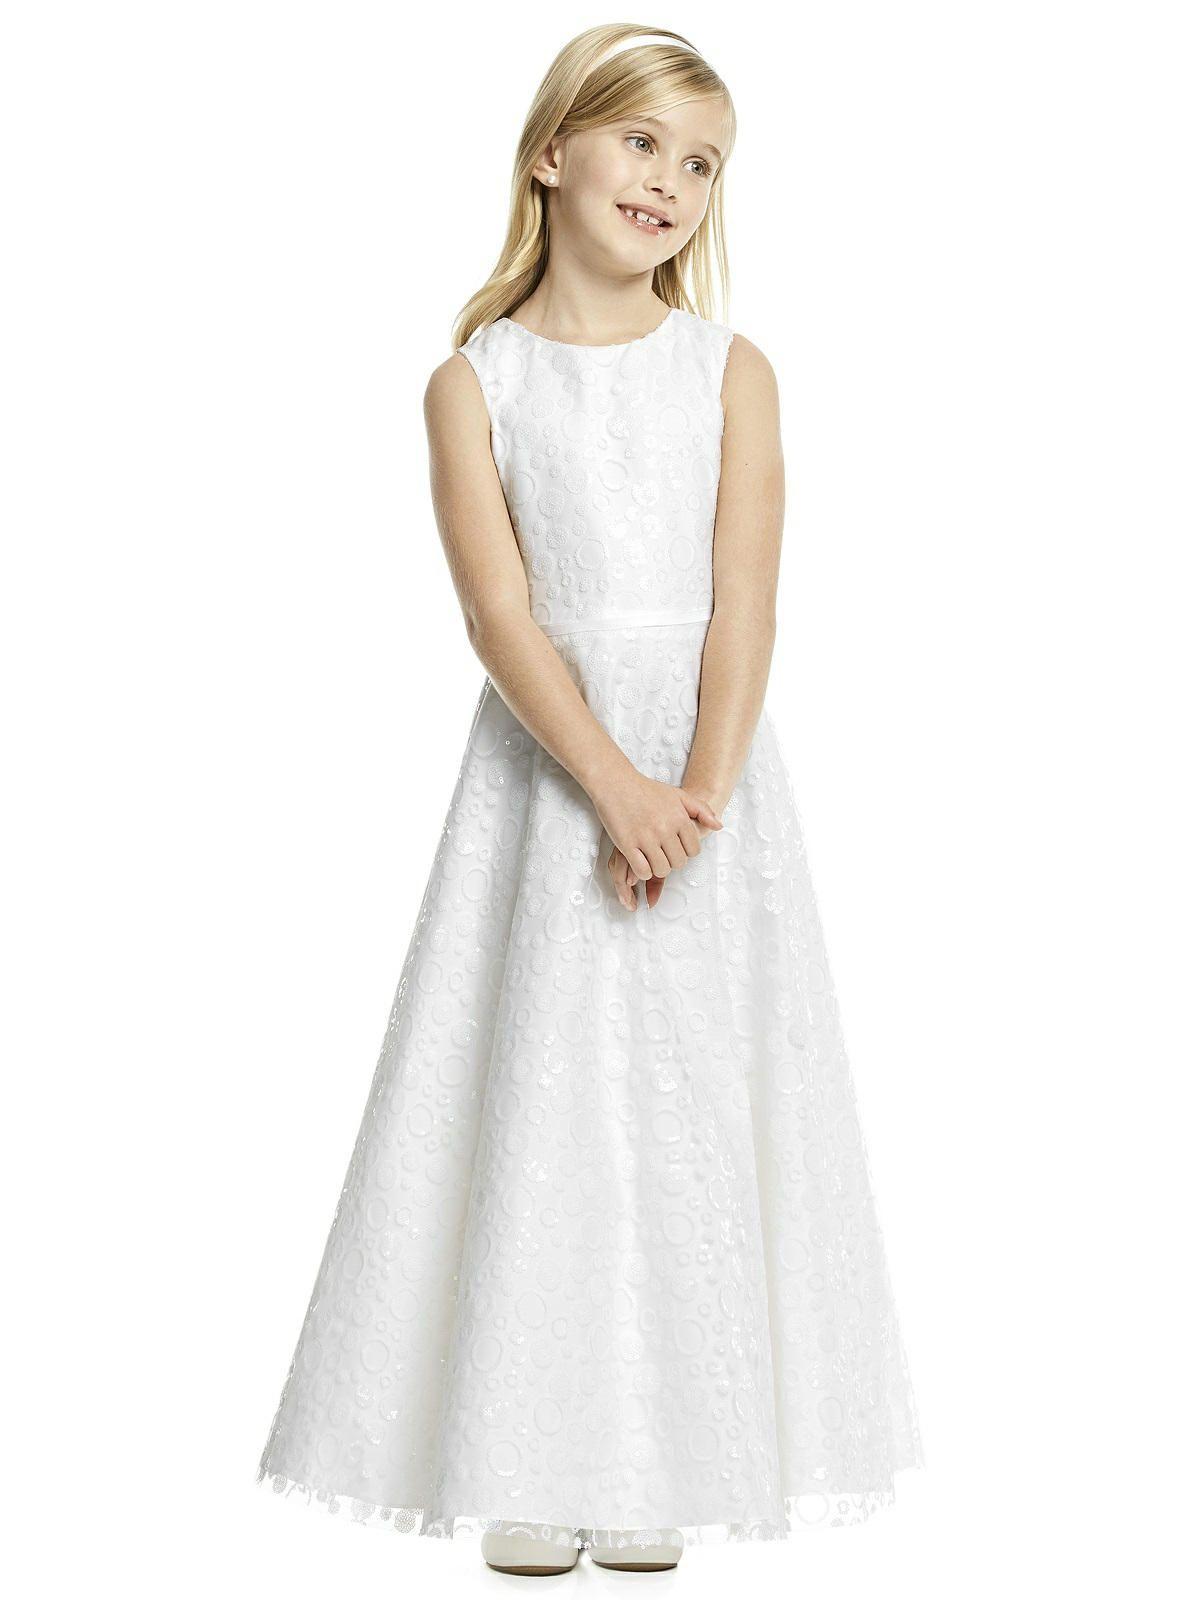 3edb6e2a5d4 Flower Girl Dress FL4056